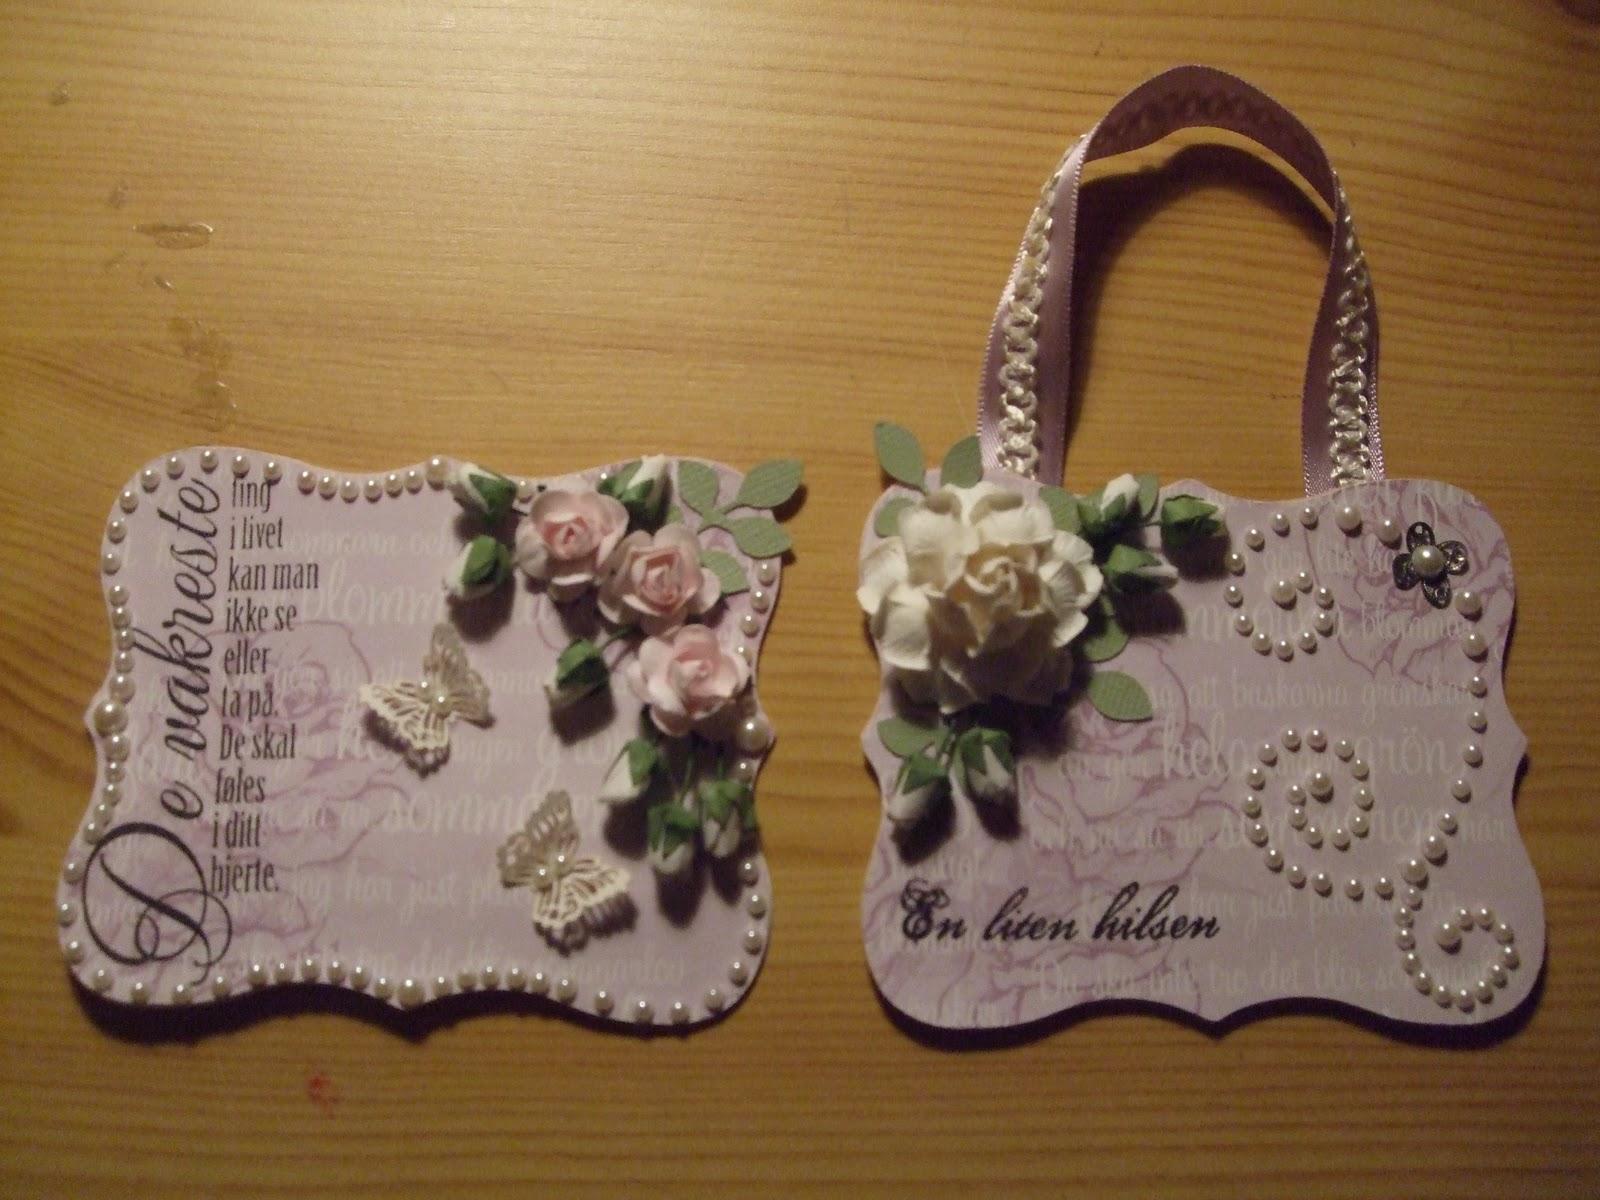 How-to-DIY-Handbag-Style-Paper-Gift-Basket-8.jpg